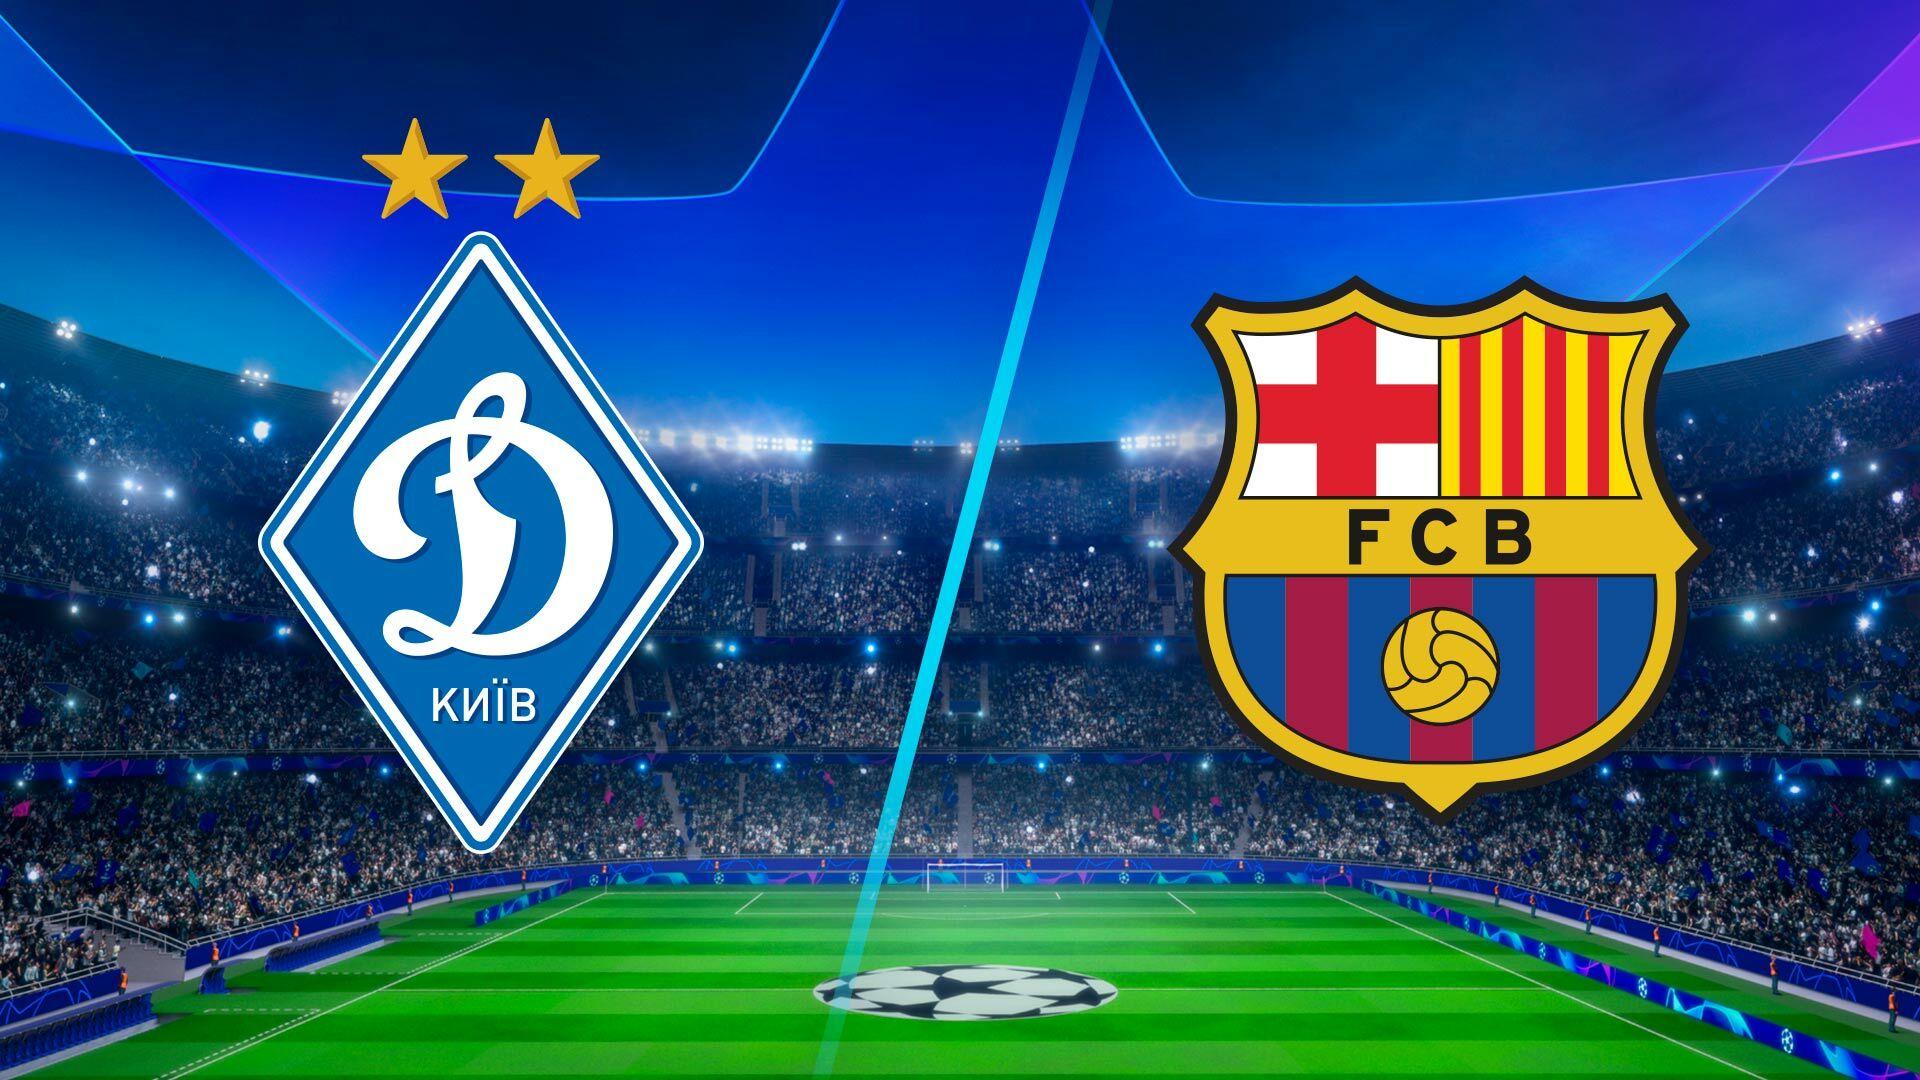 watch uefa champions league season 2021 episode 65 dynamo kyiv vs barcelona full show on paramount plus